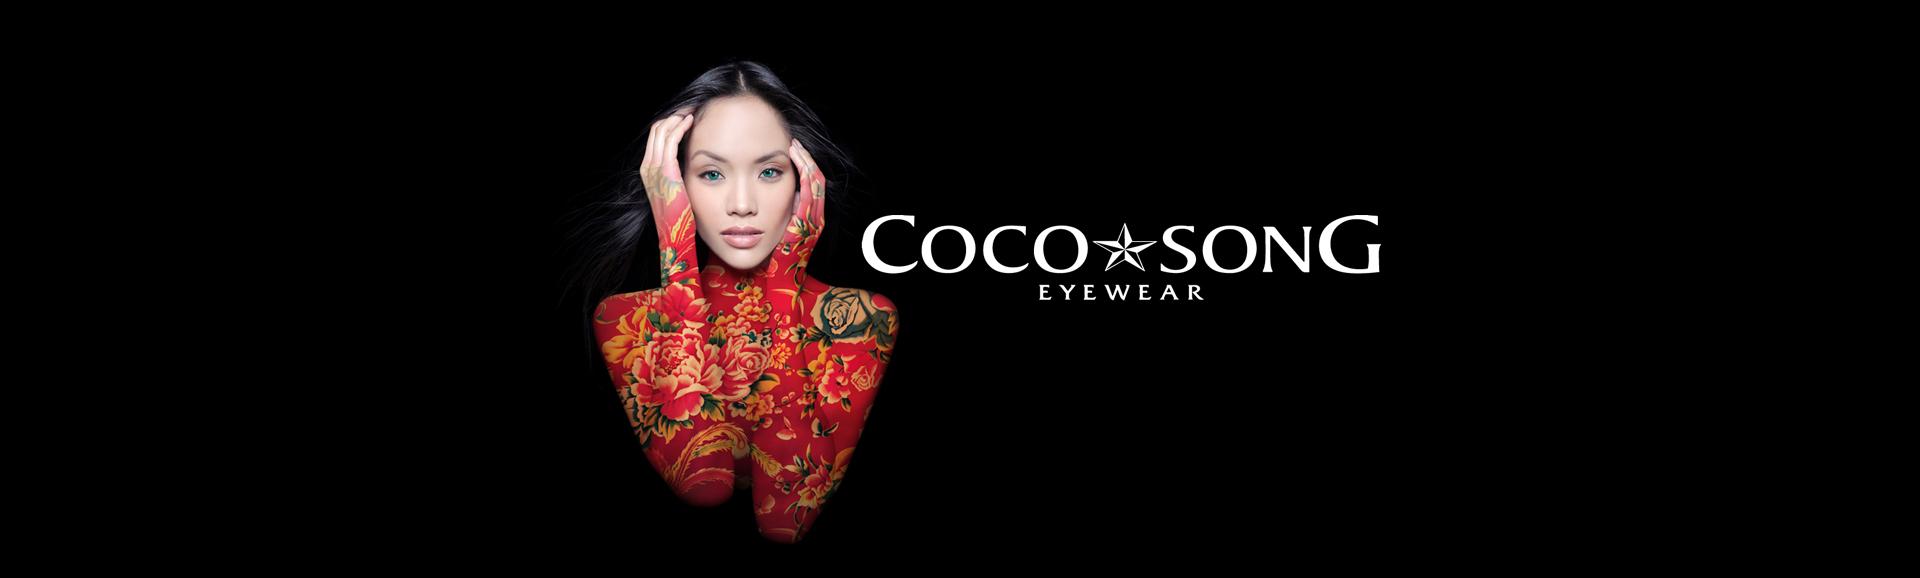 cocosong-slide1